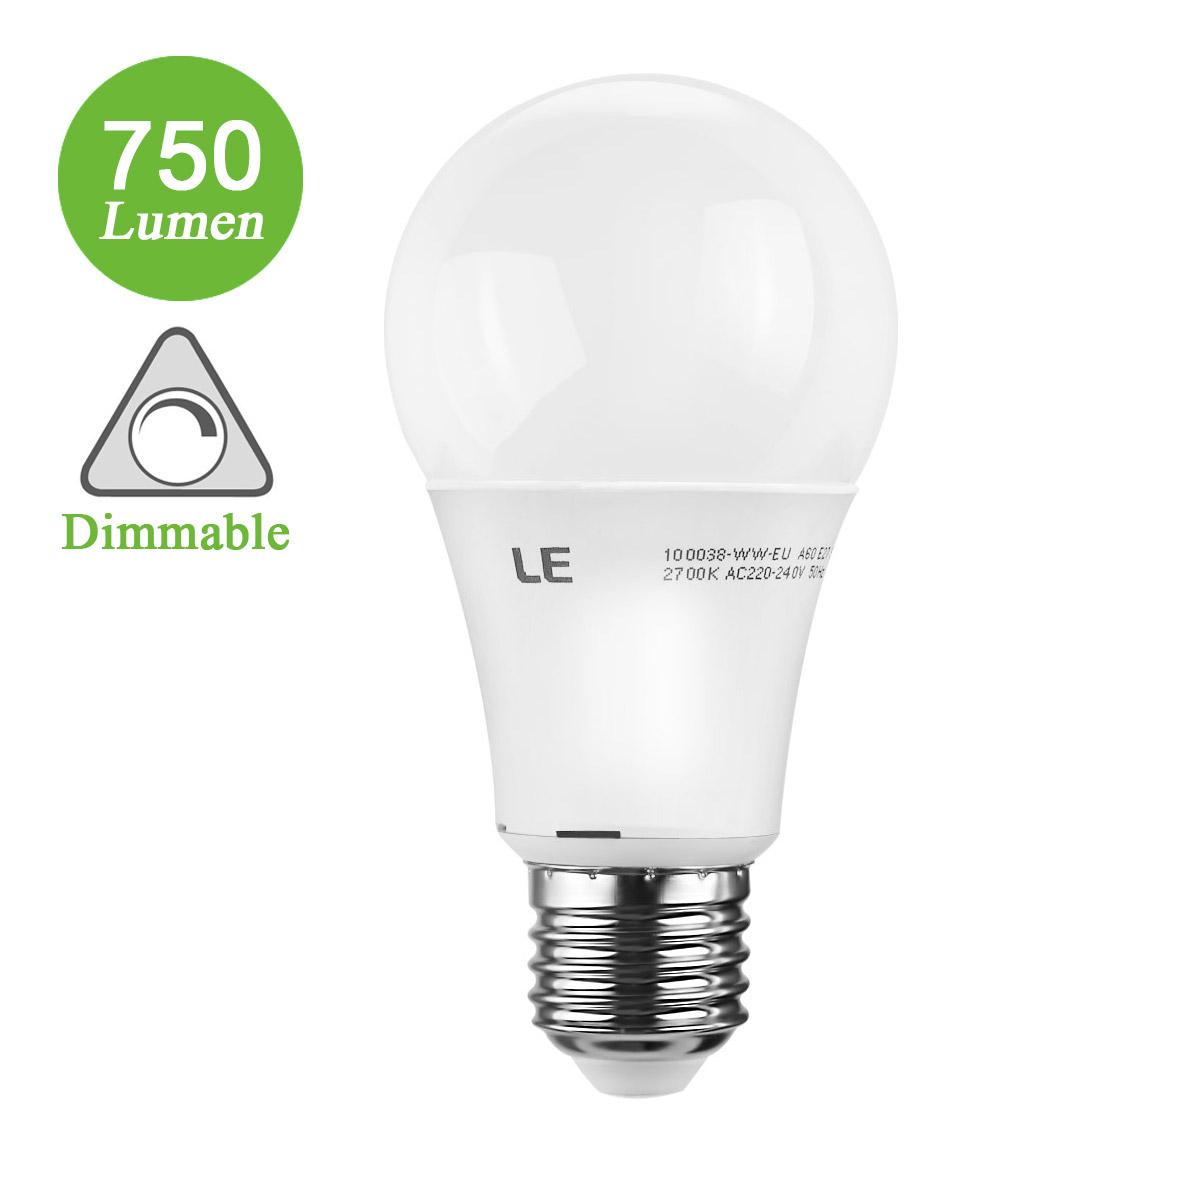 9.5W Dimmbare A60 E27 LED Lampen,  750lm Edison Lampen, ersetzt 60 Watt Glühlampe, Warmweiß